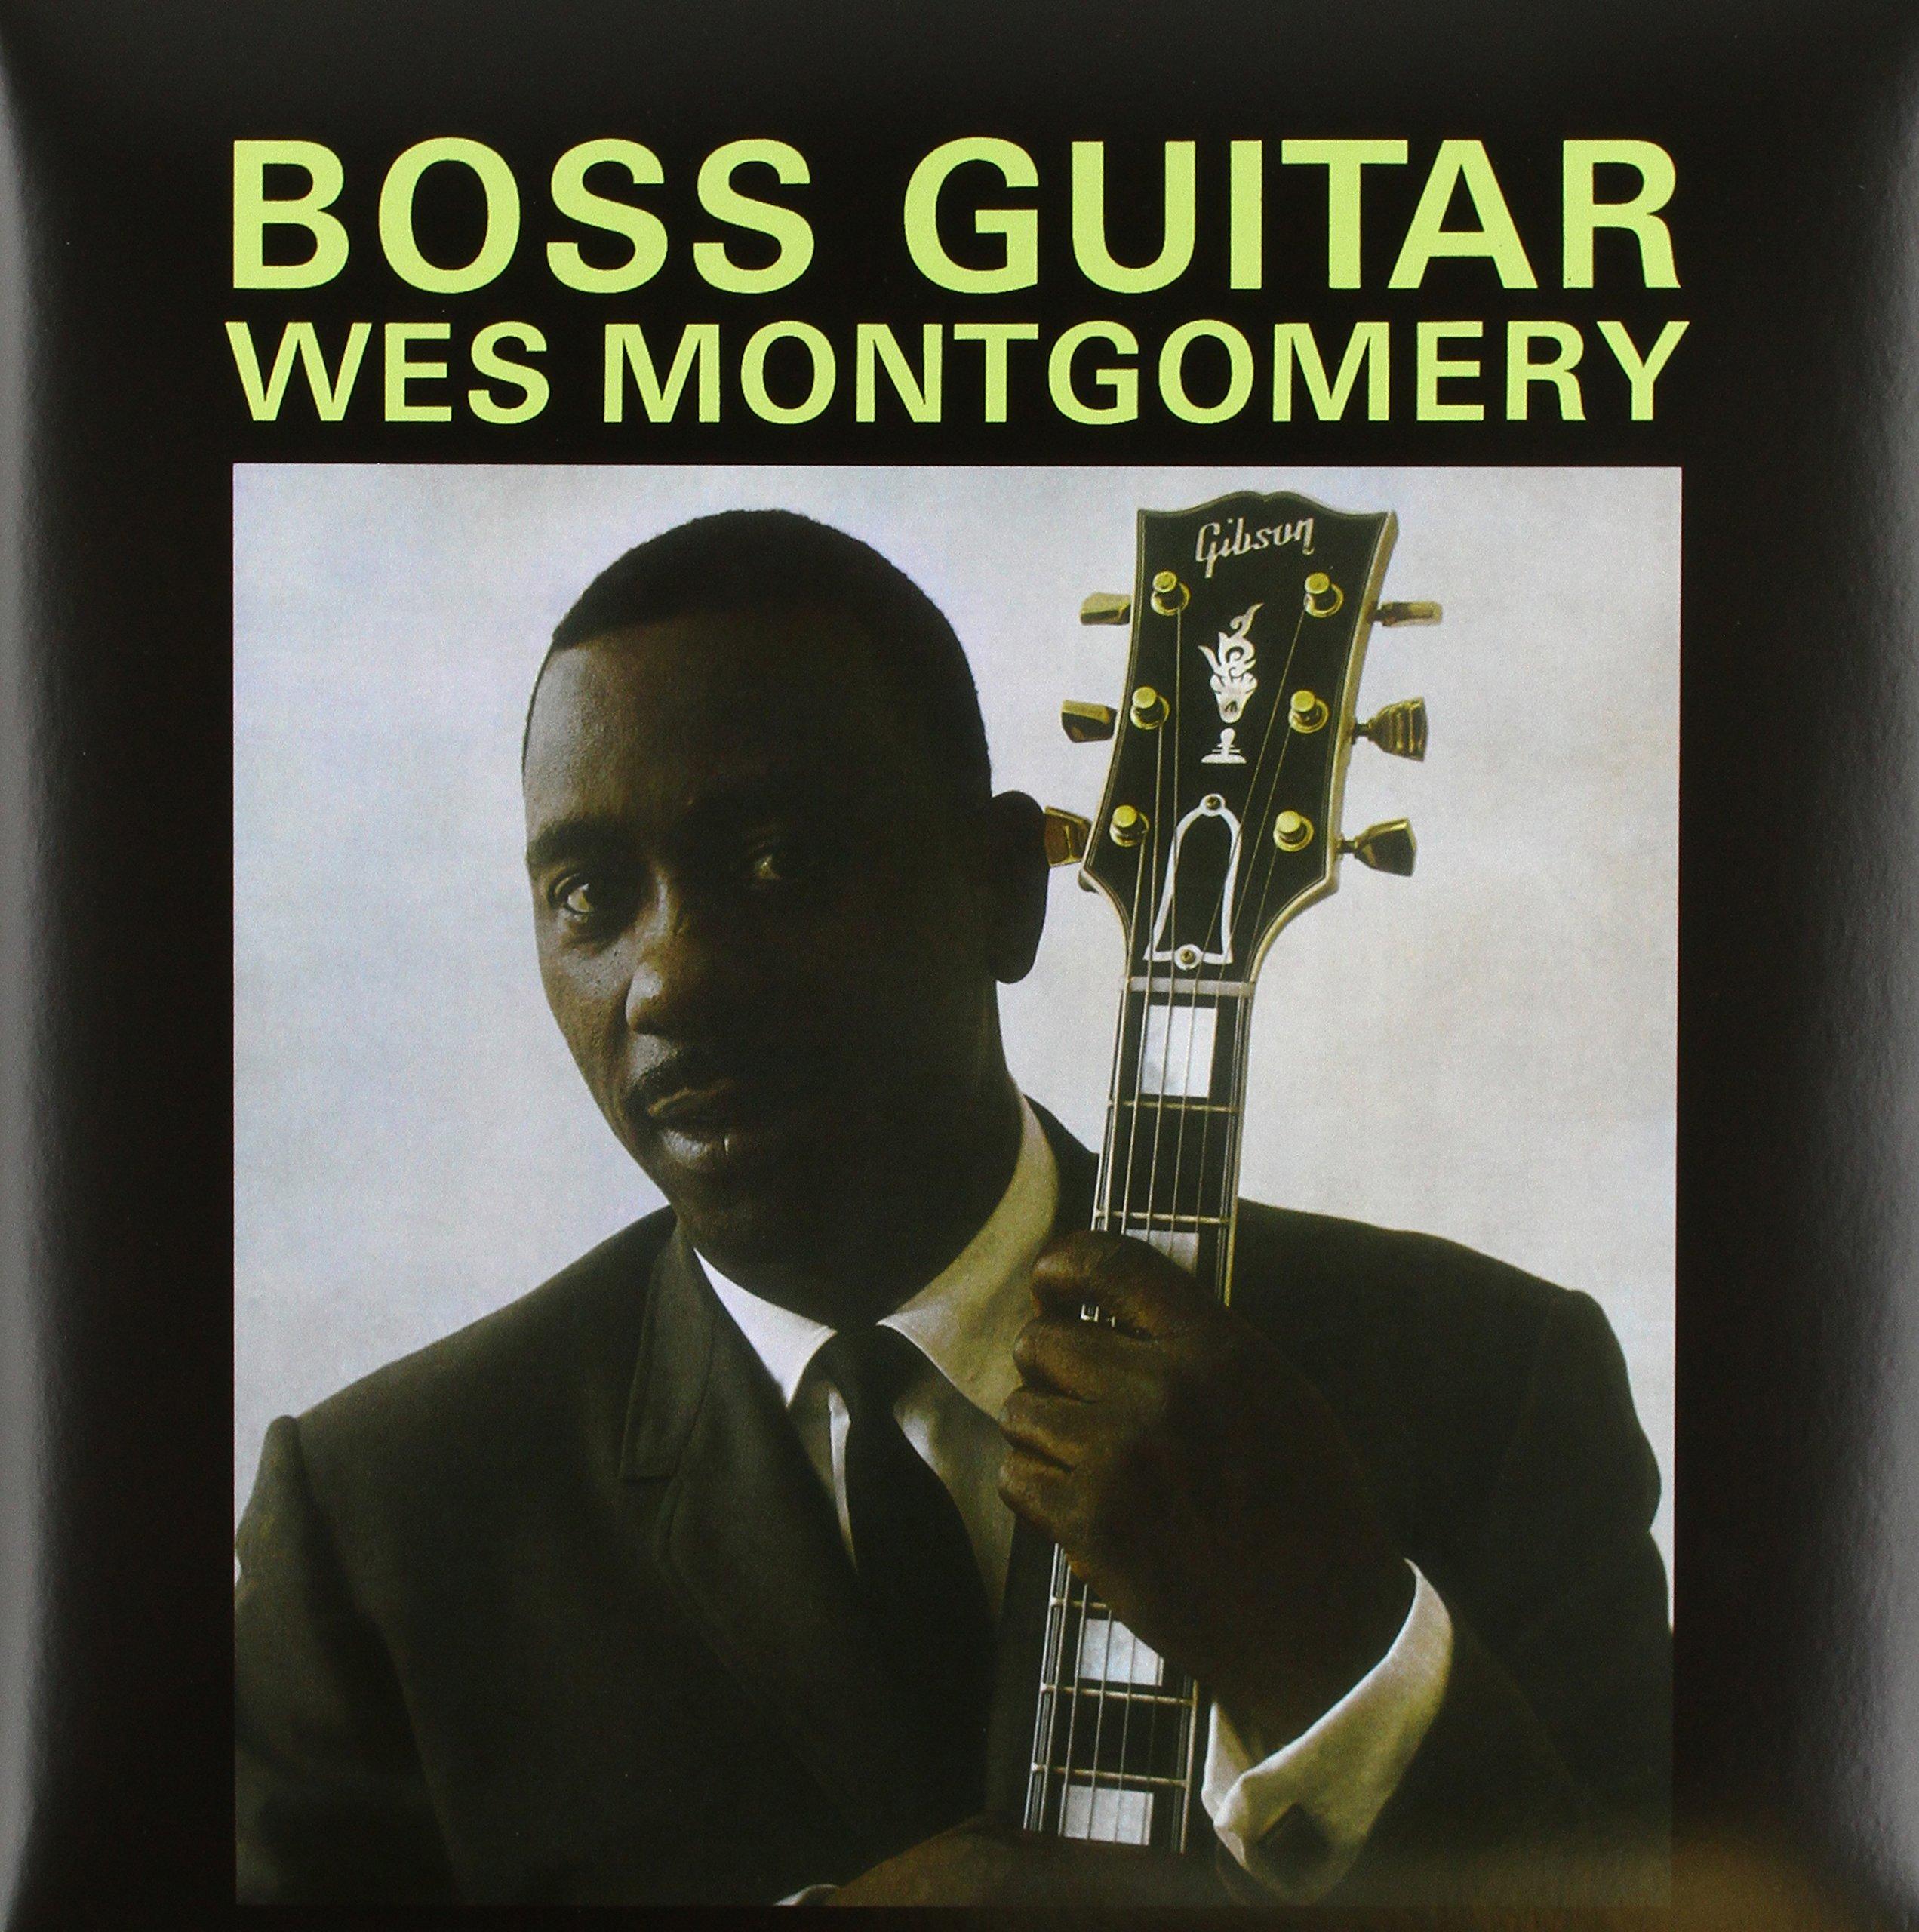 Vinilo : Wes Montgomery - Boss Guitar (Gatefold LP Jacket, Deluxe Edition, United Kingdom - Import)